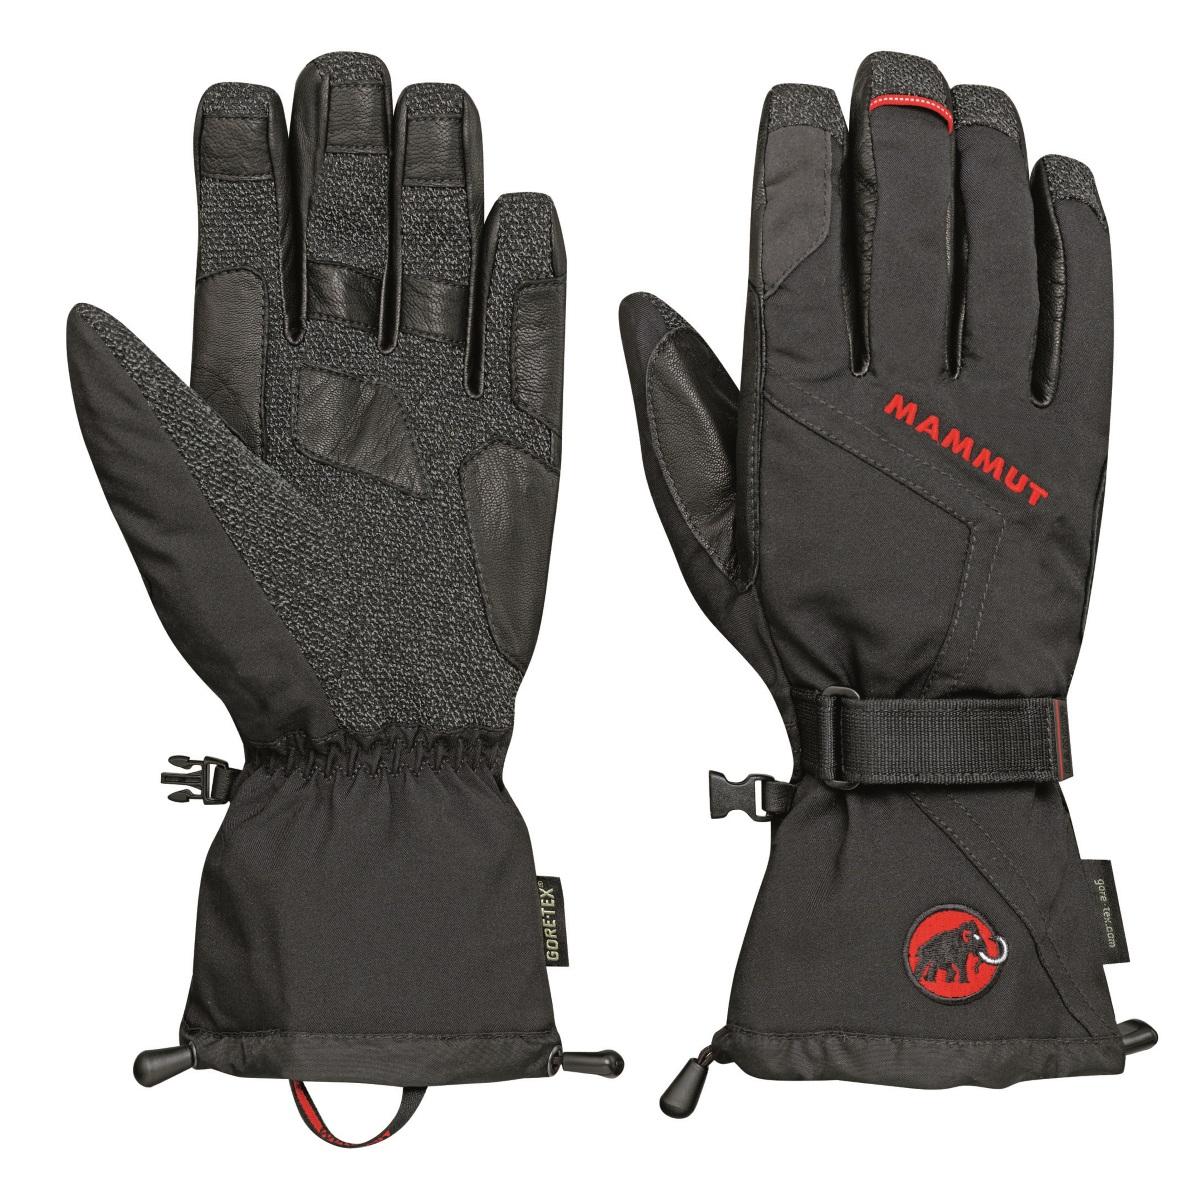 Mammut Expert Pro Glove Free Ground Shipping Gloves